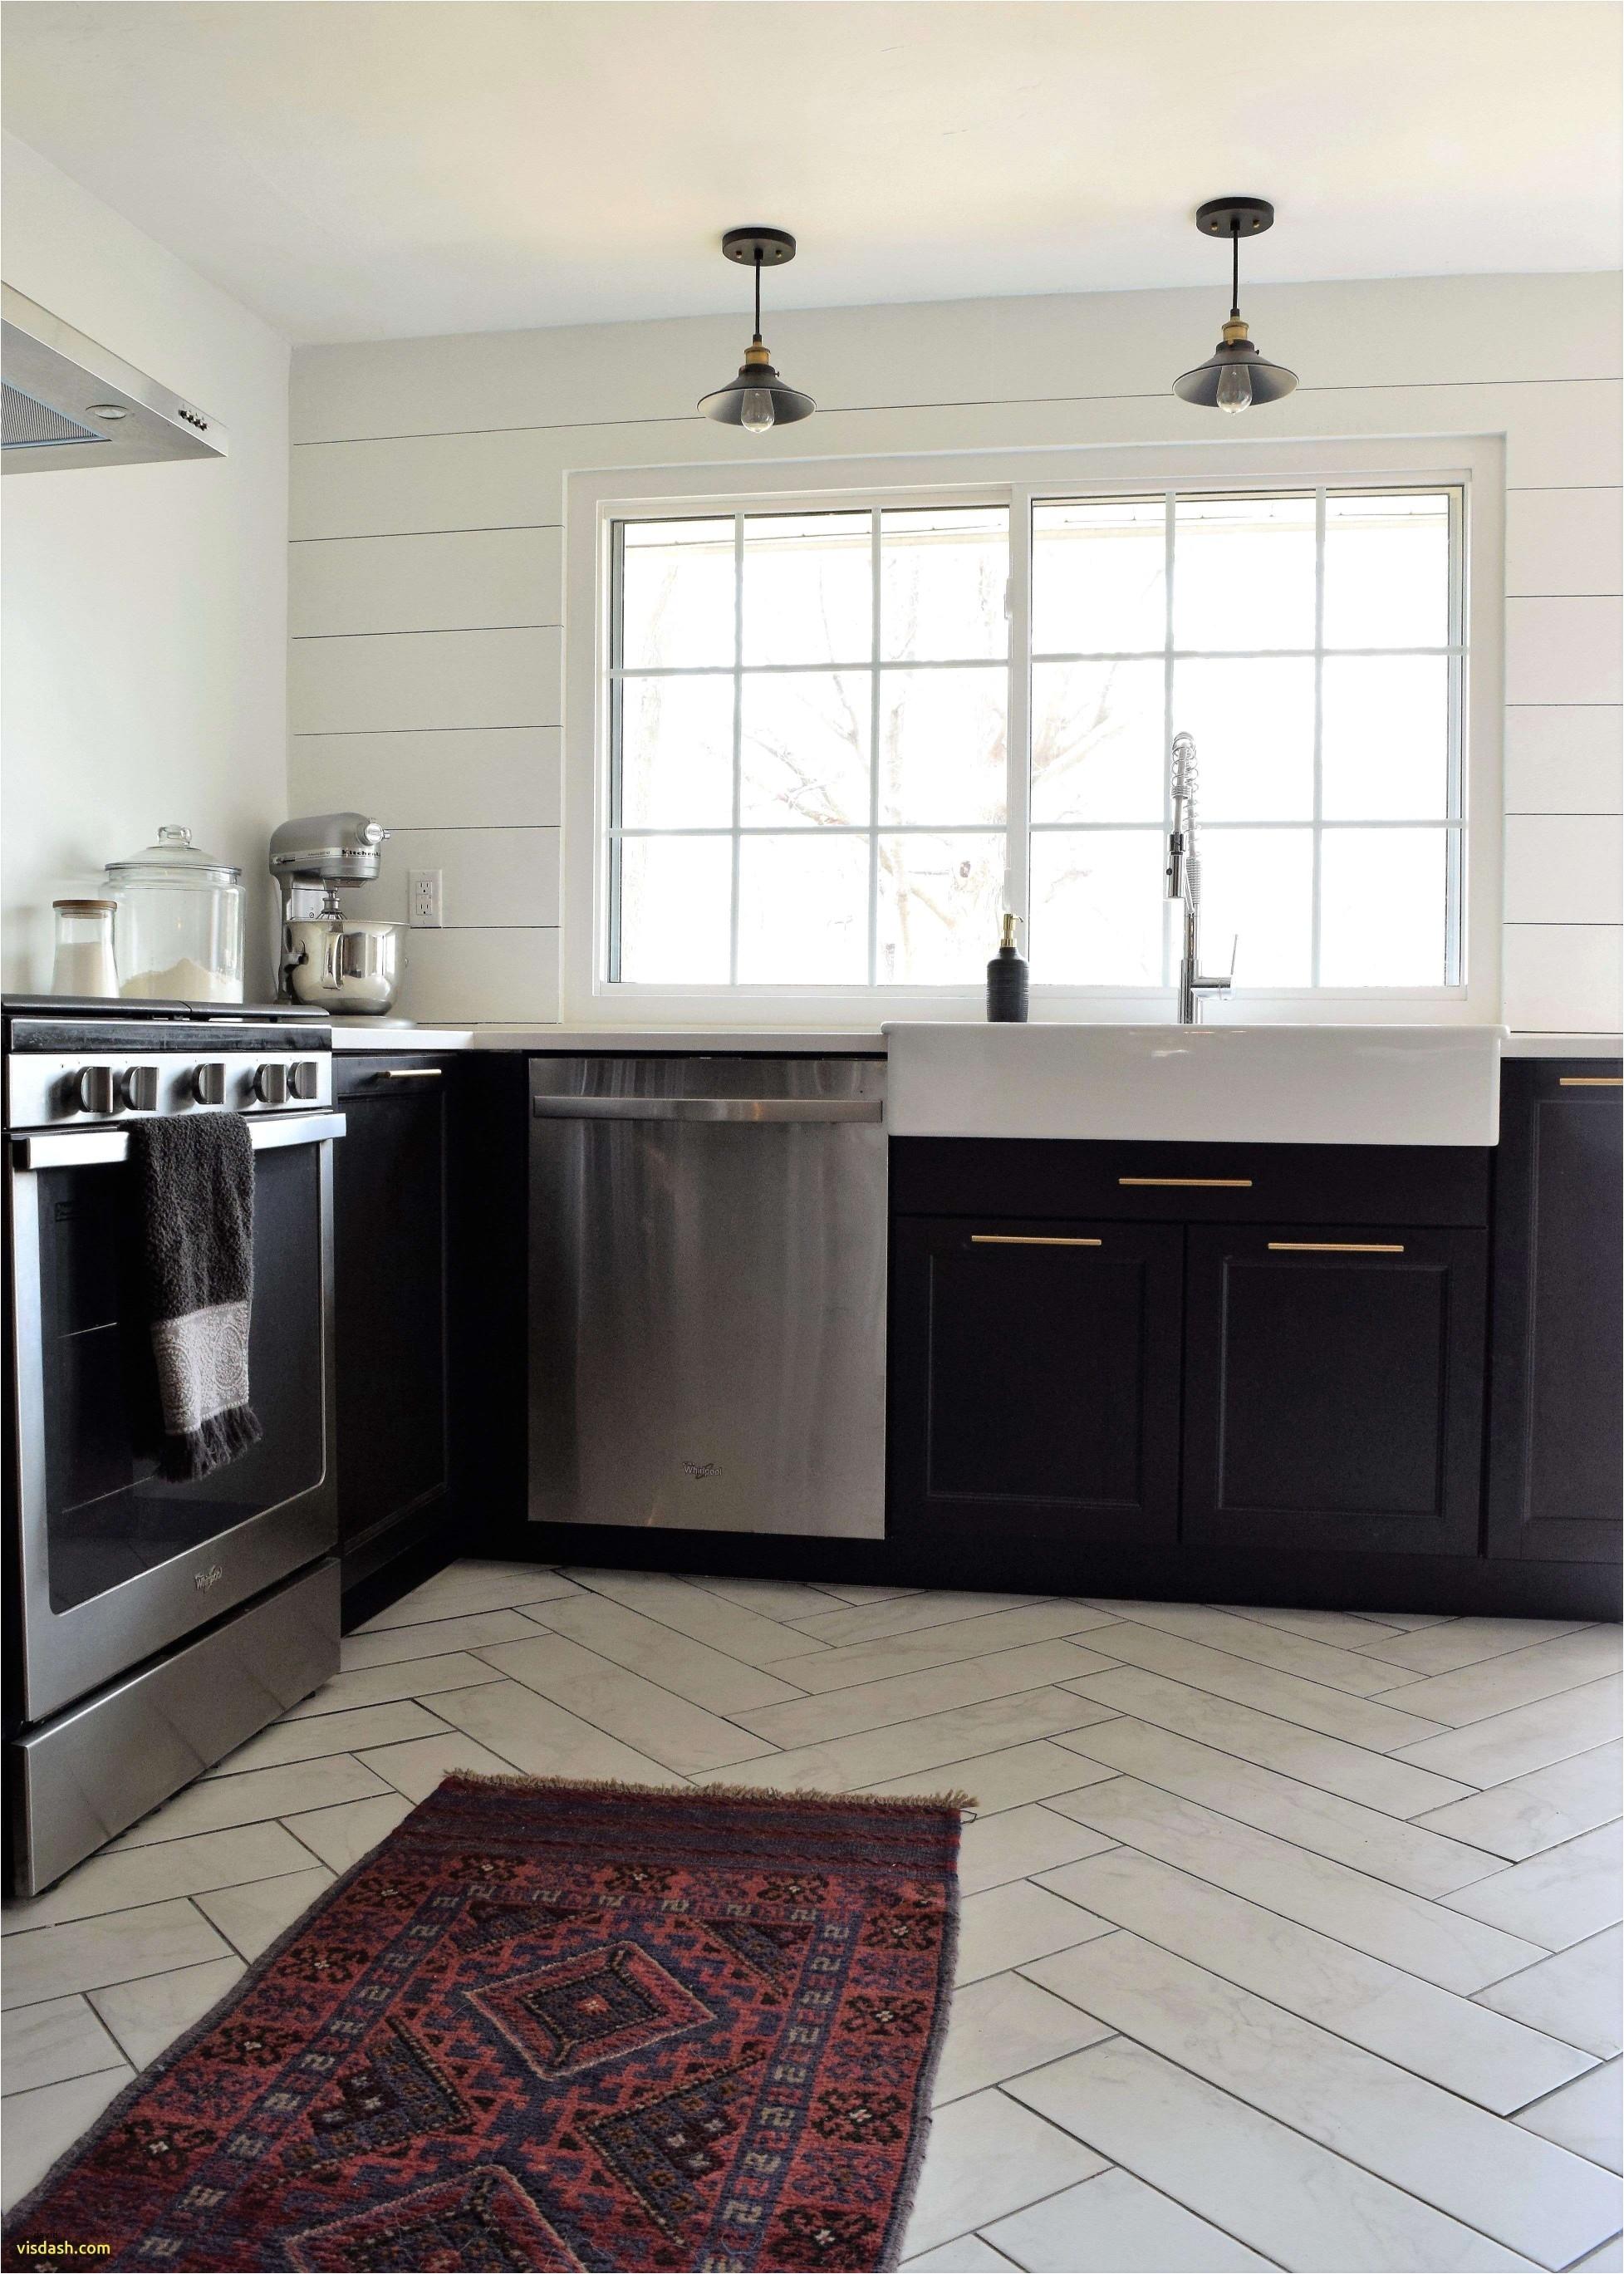 small kitchen designs with island luxury kitchen design pics elegant kitchen design 0d design kitchen ideas